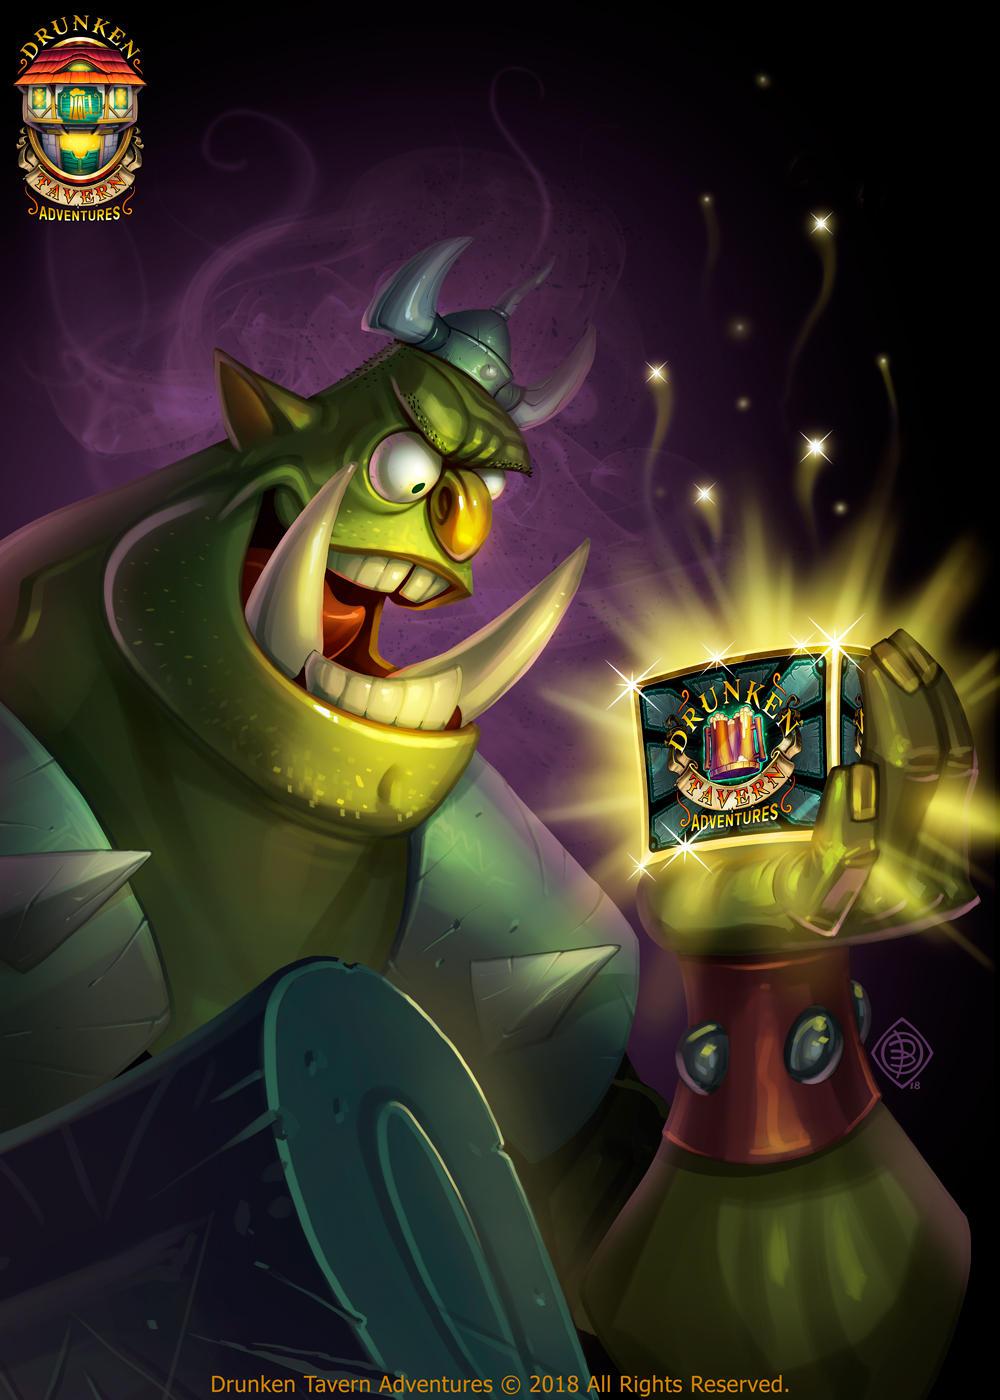 Orc - Drunken Tavern Adventures by Lord-Dragon-Phoenix